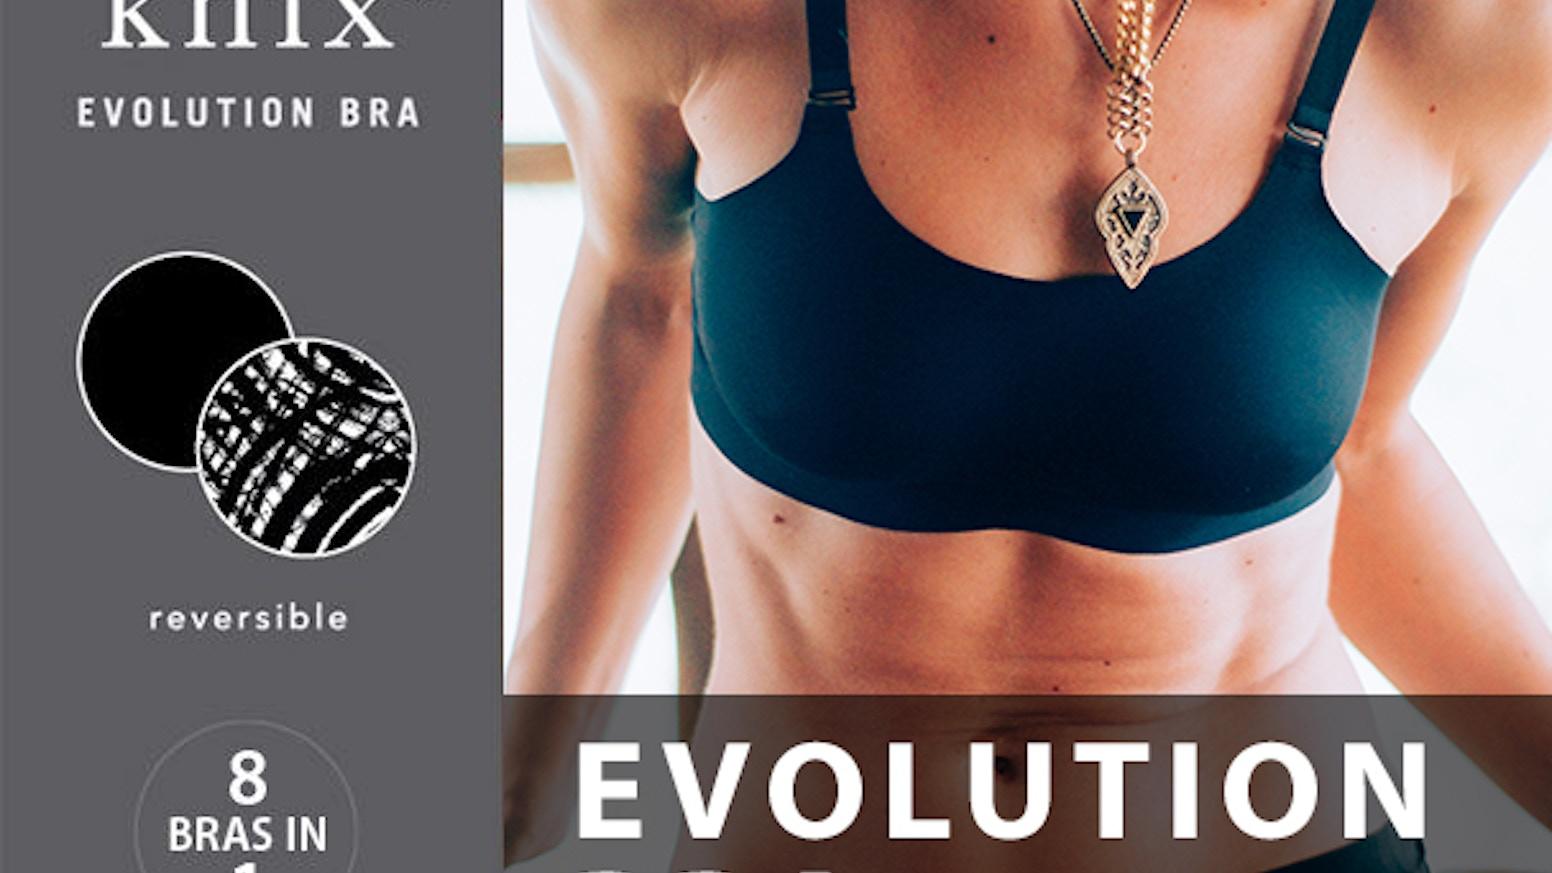 a847073d248 8-in-1 EVOLUTION BRA  The World s Most Advanced Bra by Knix Wear ...